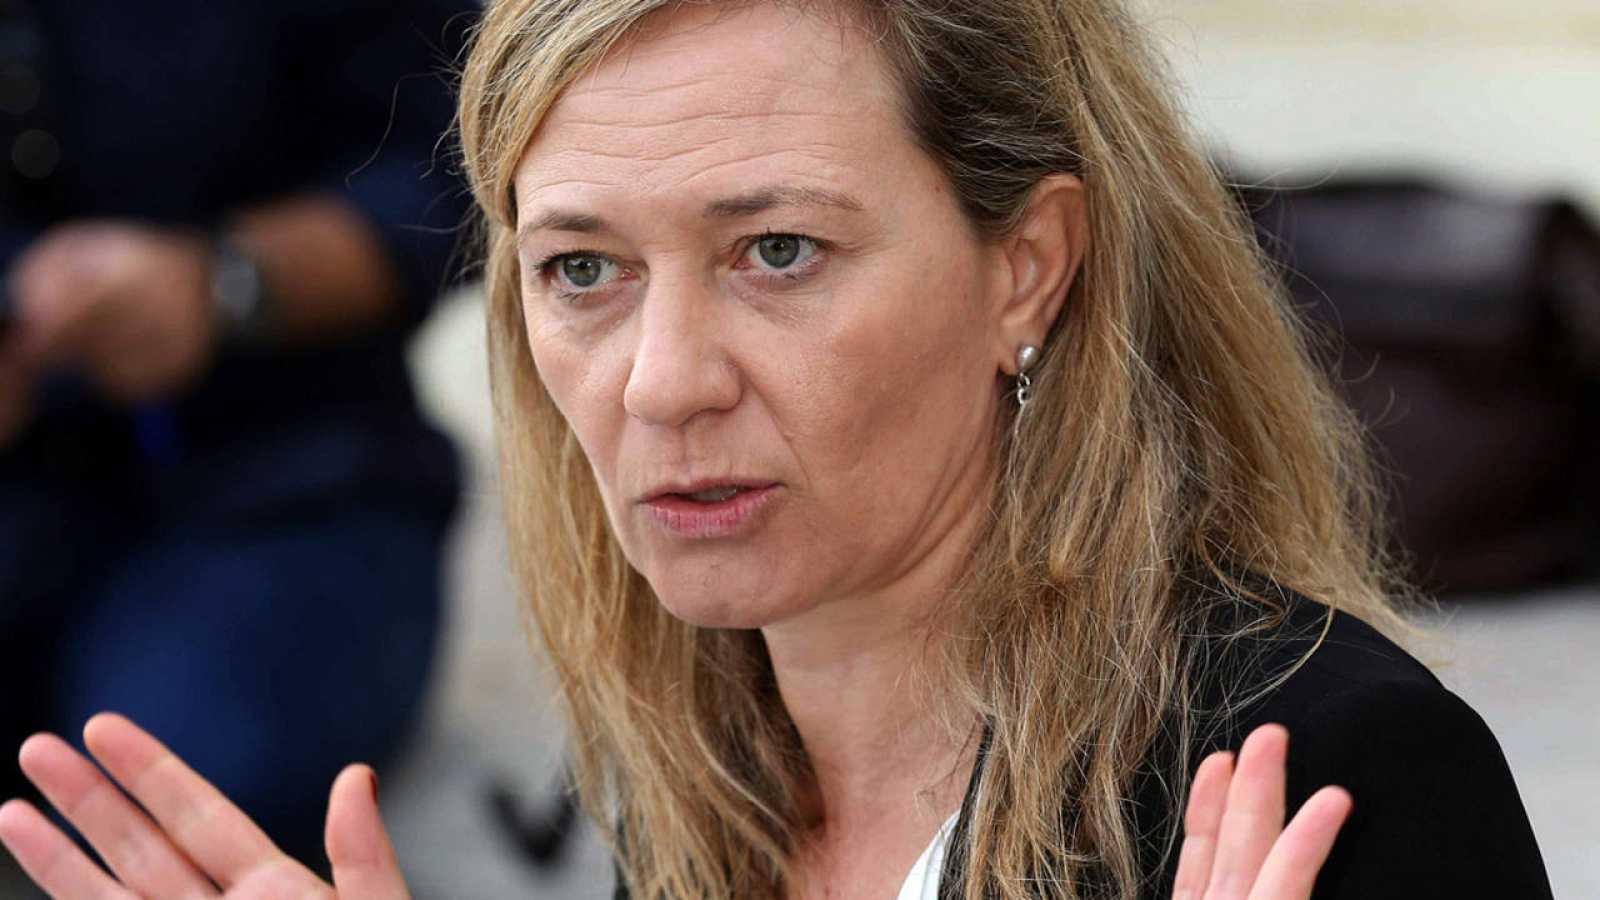 La exdiputada de Podemos, Victoria Rosell